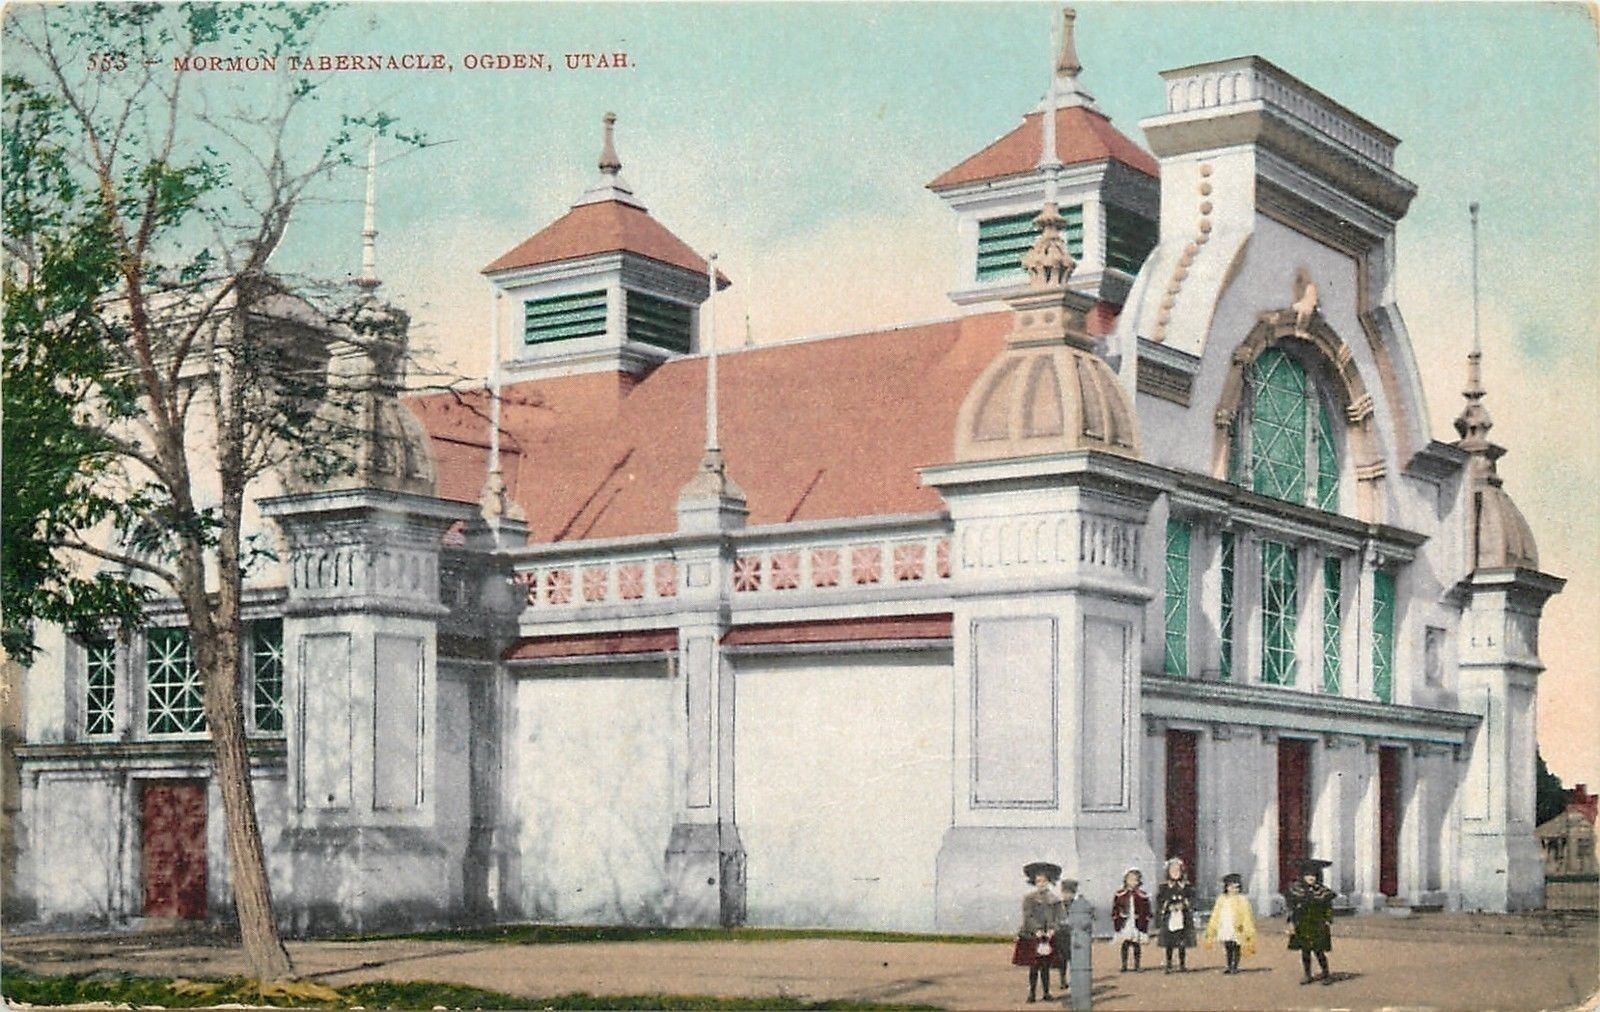 Ogden Ut Ornate Towers Twin Belfreys Mormon Tabernacle 1910